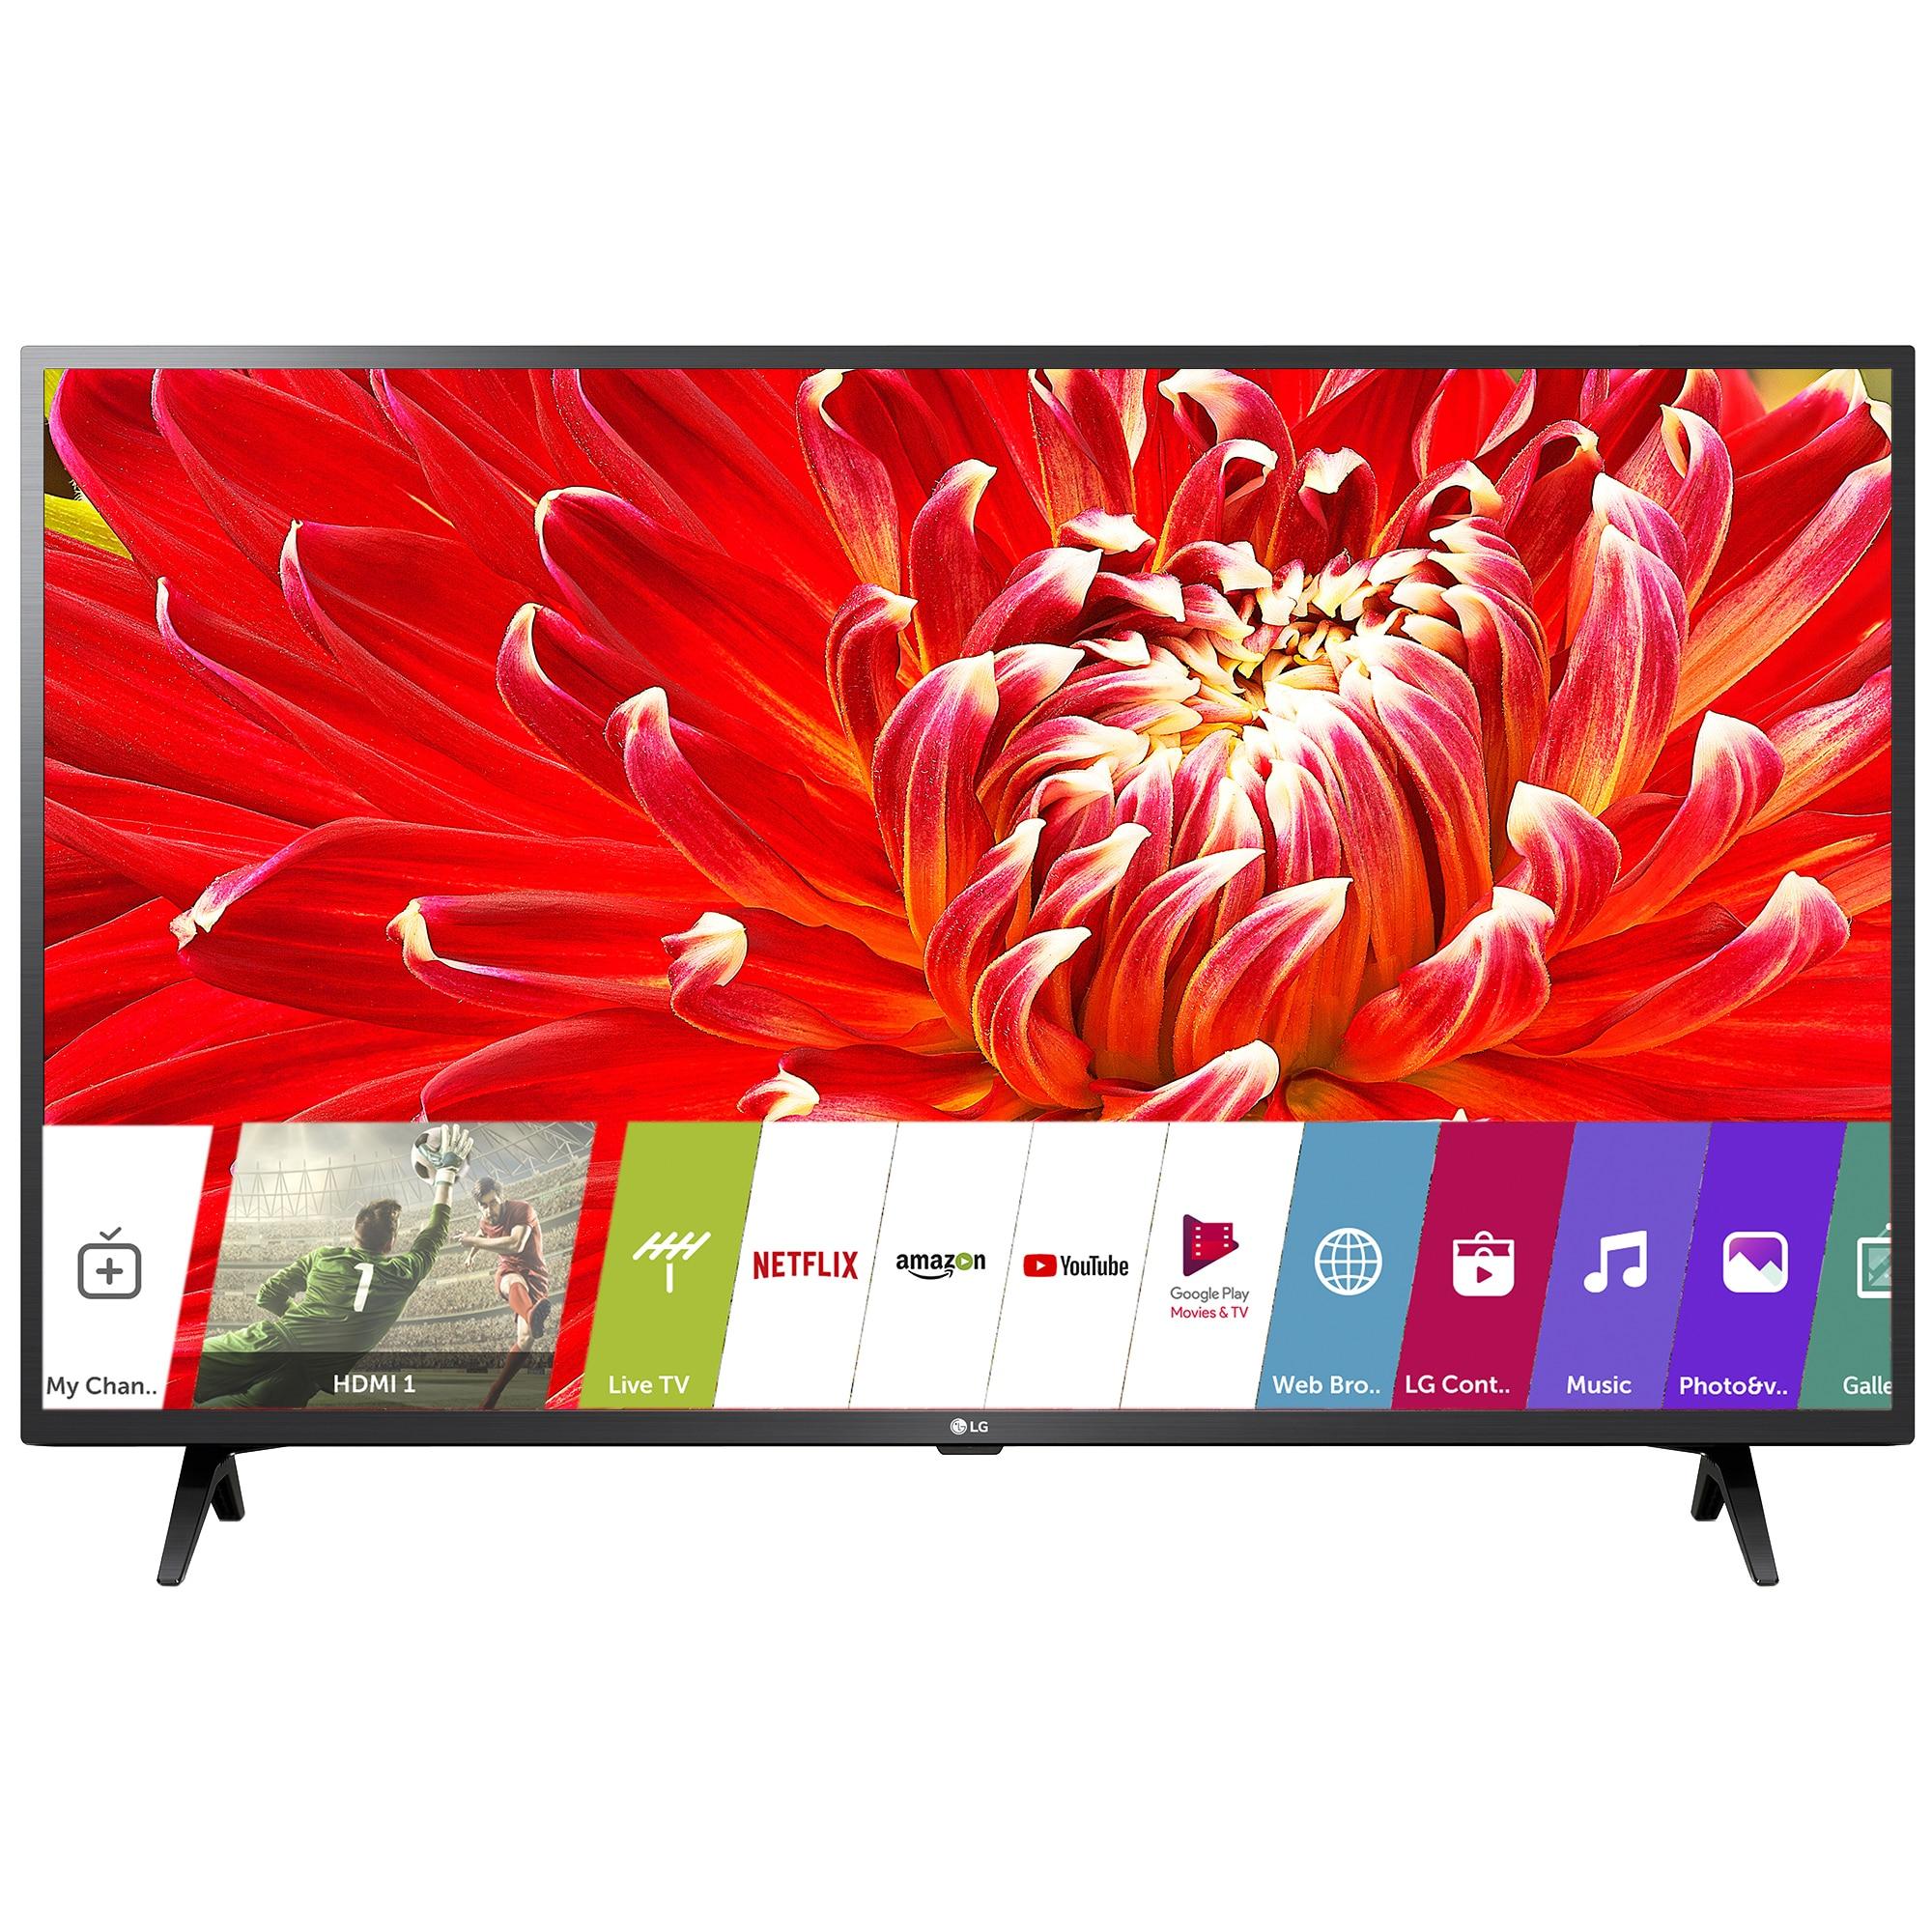 Fotografie Televizor LG 43LM6300PLA, 108 cm, Smart, Full HD, LED, Clasa F